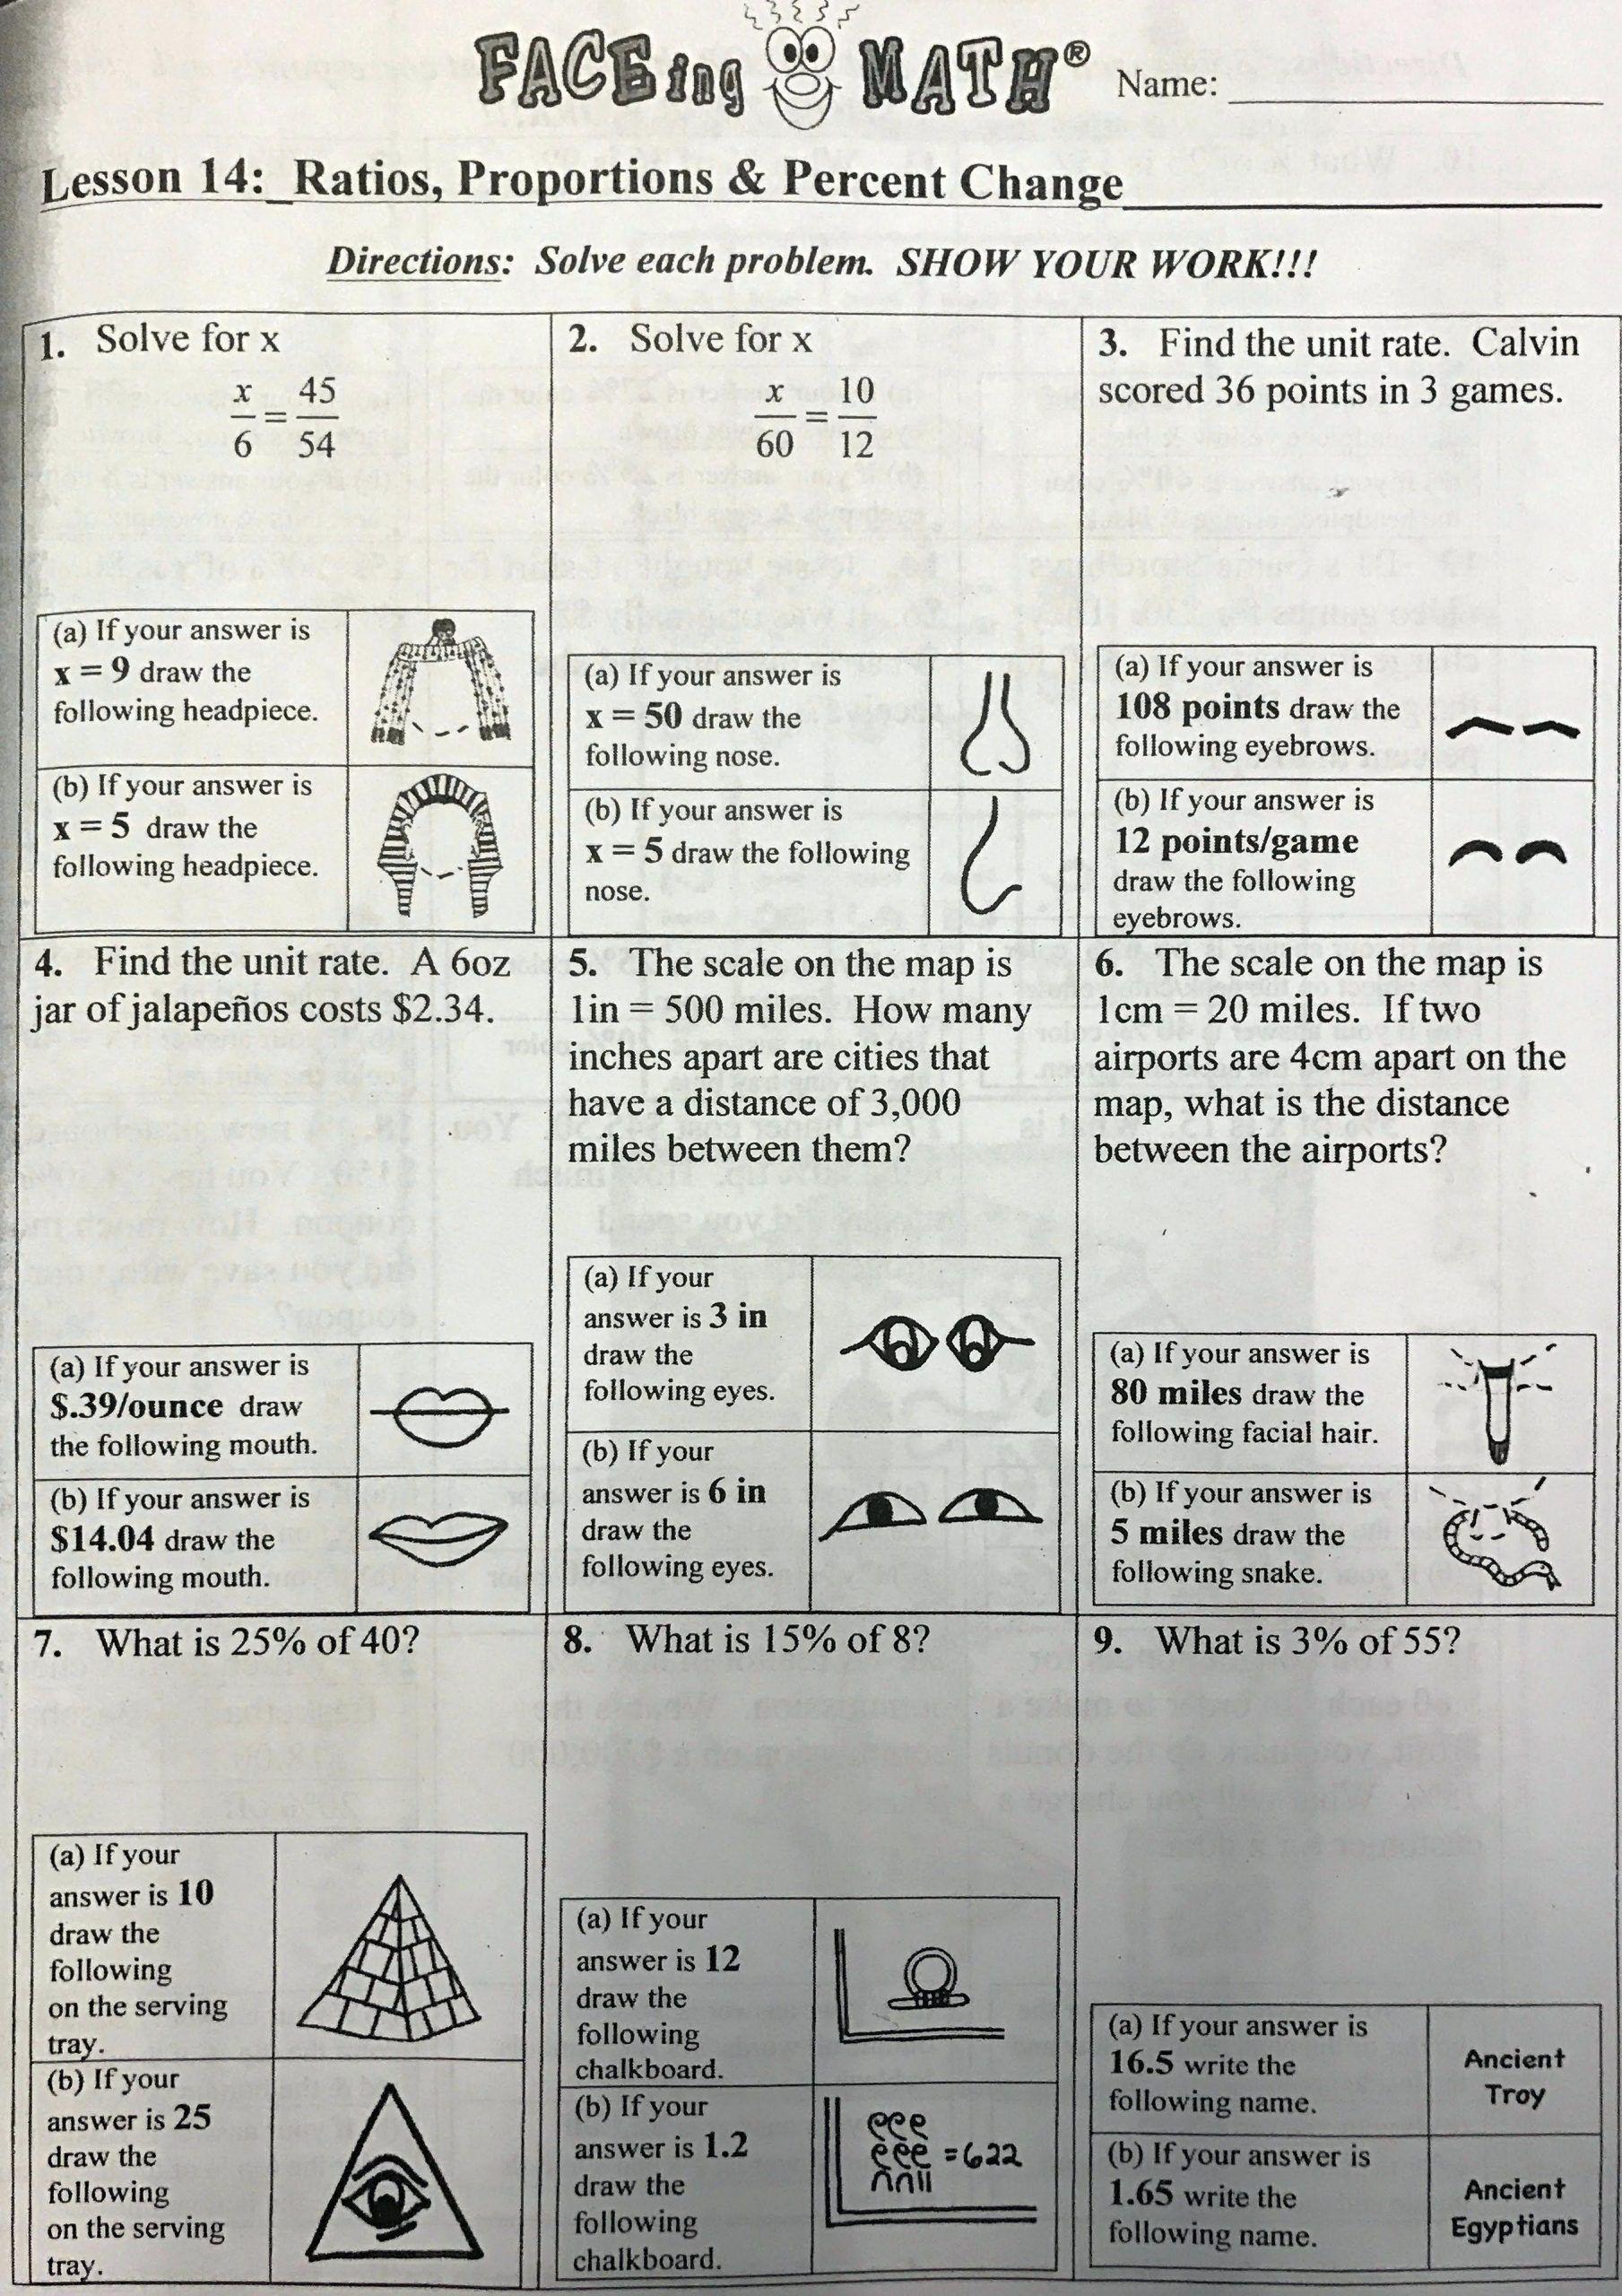 Faceing Math Printable Worksheets Worksheet For Prk Math Math Printables Reading Graphs Printable Worksheets